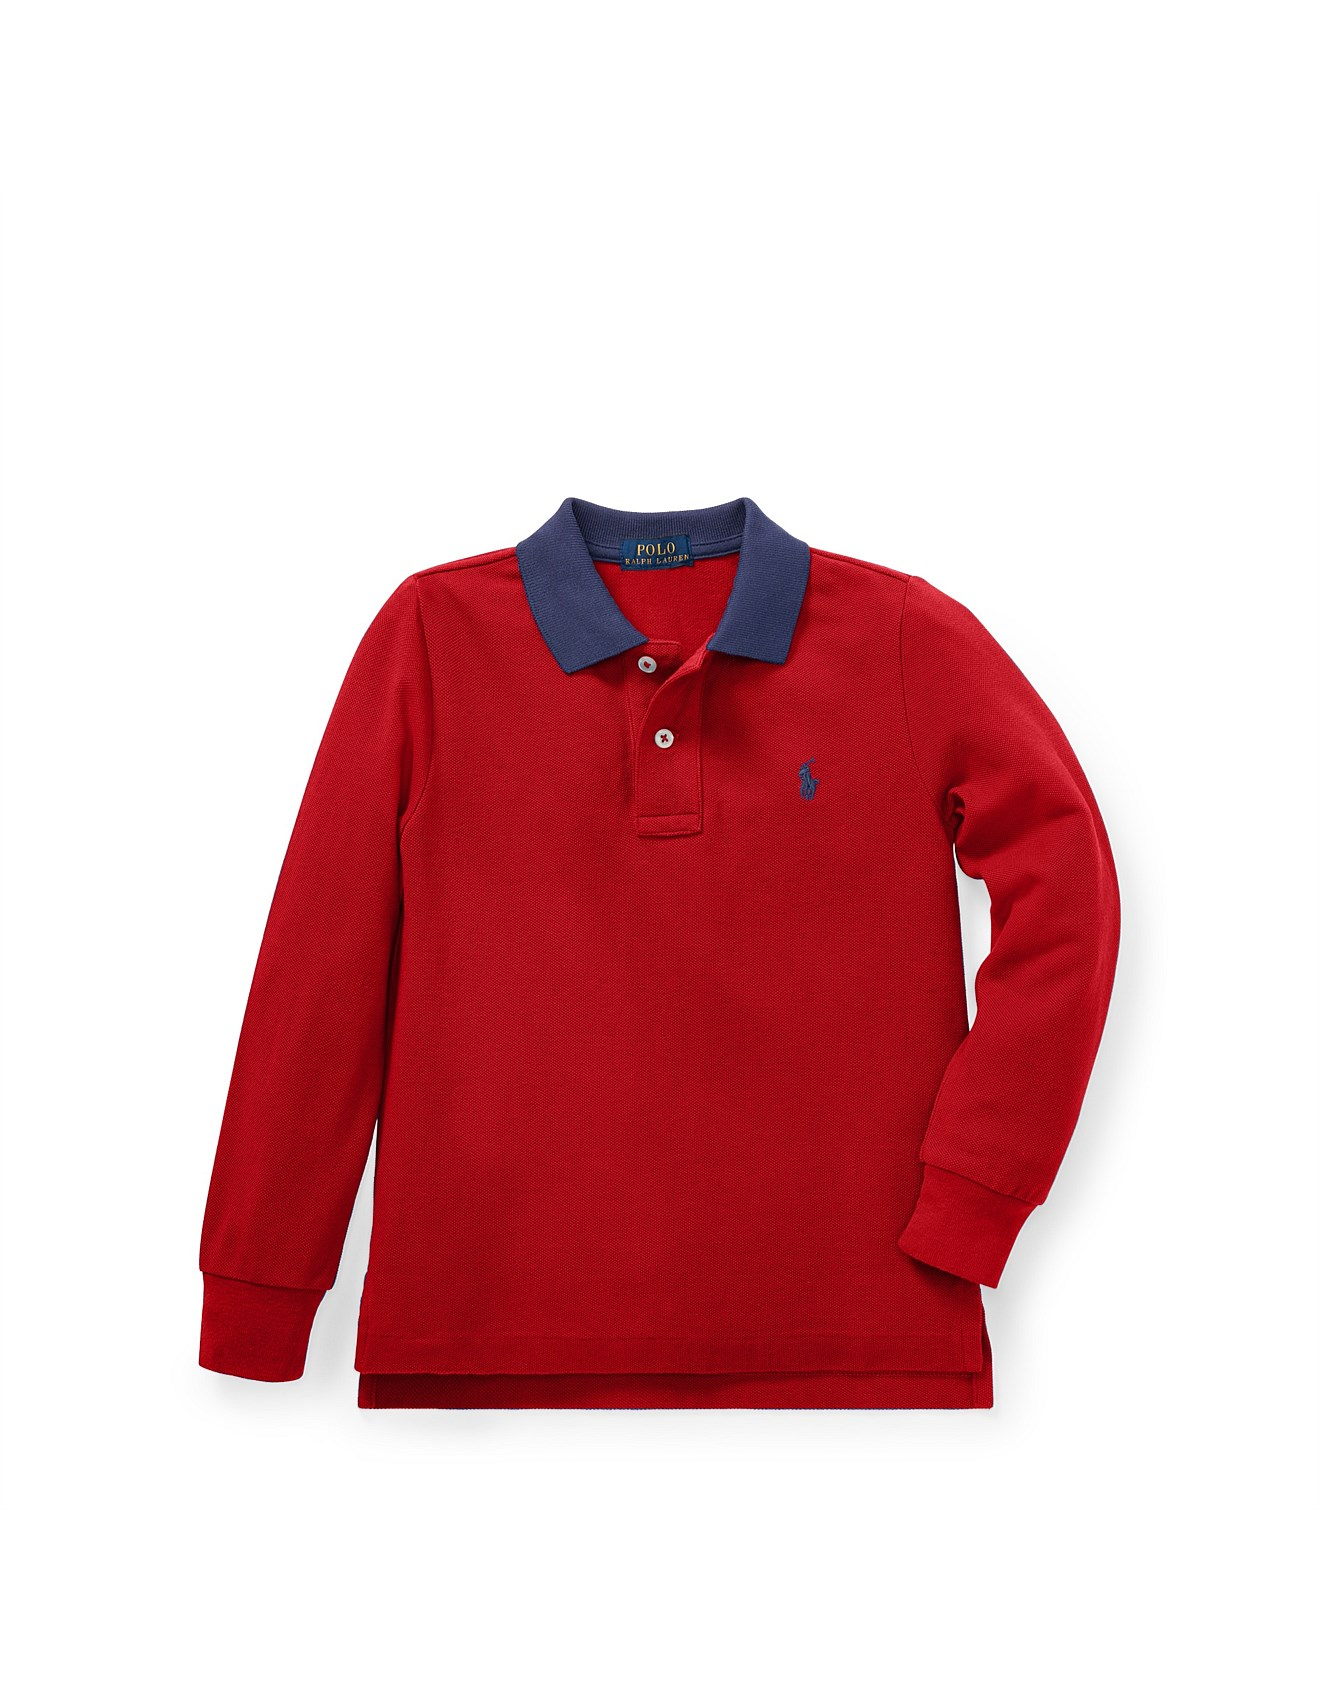 eb74457f0 Cotton Mesh Polo Shirt (2-3 Years)